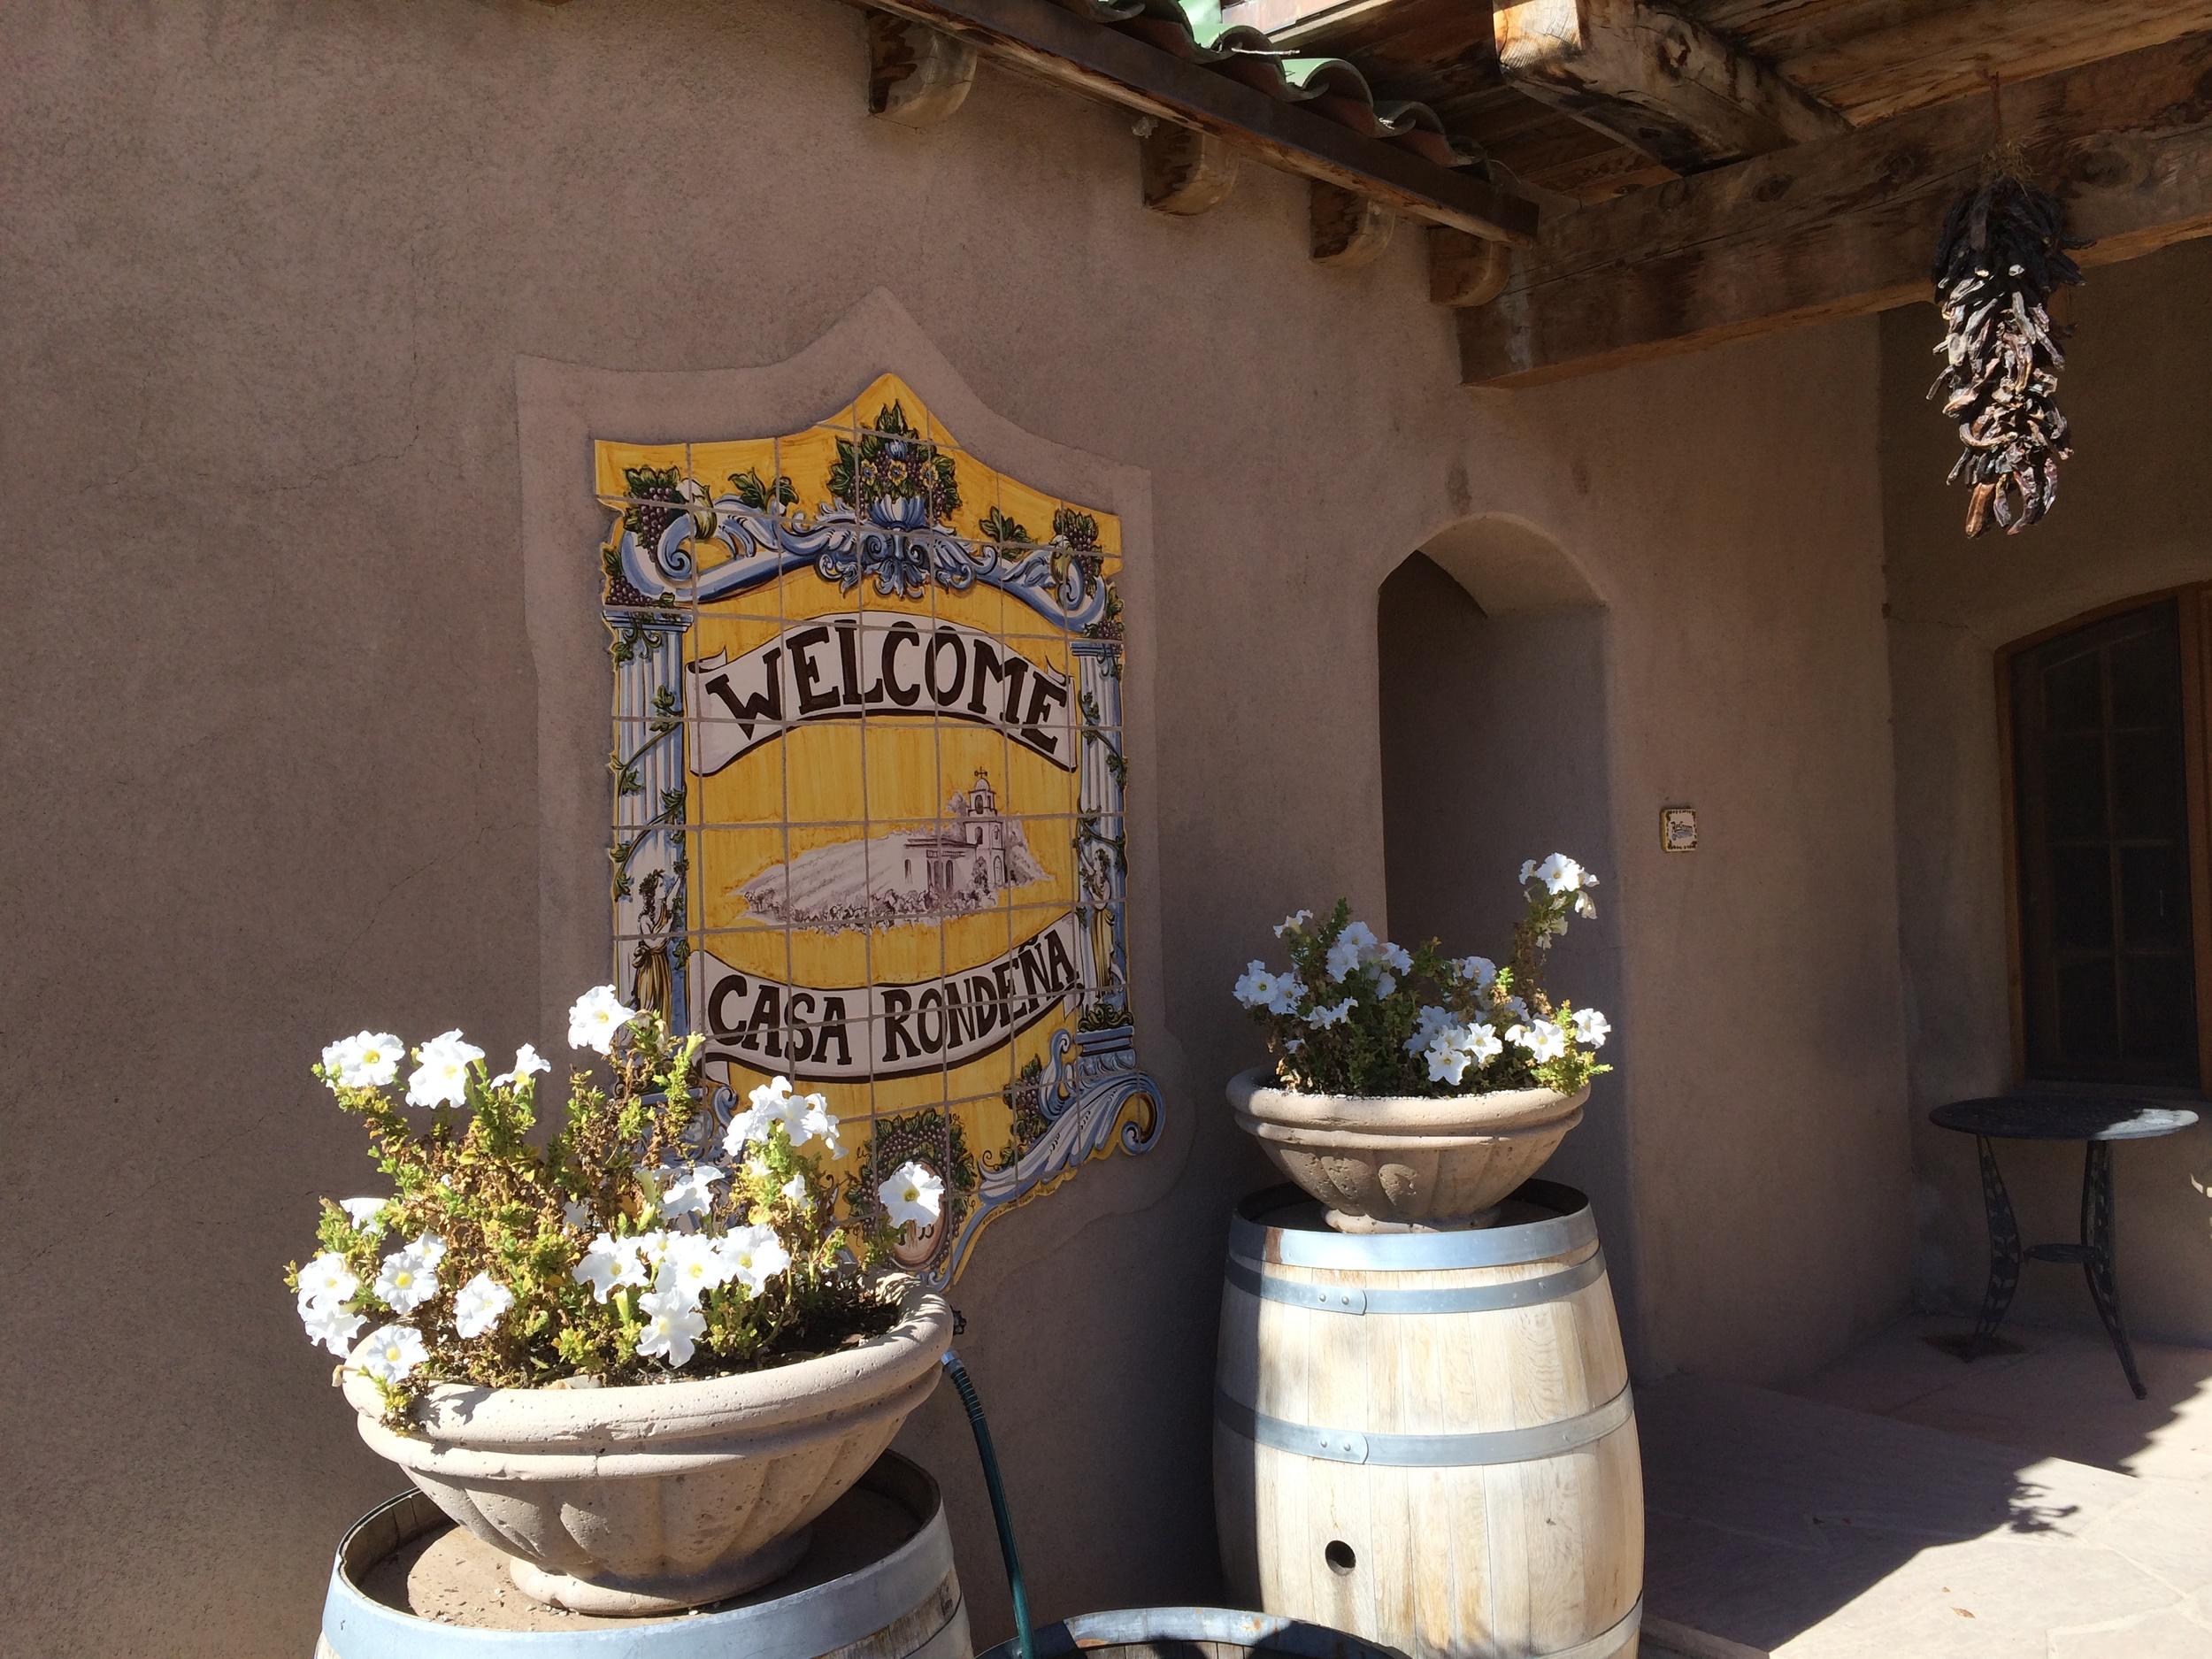 Casa Rondena winery entrance